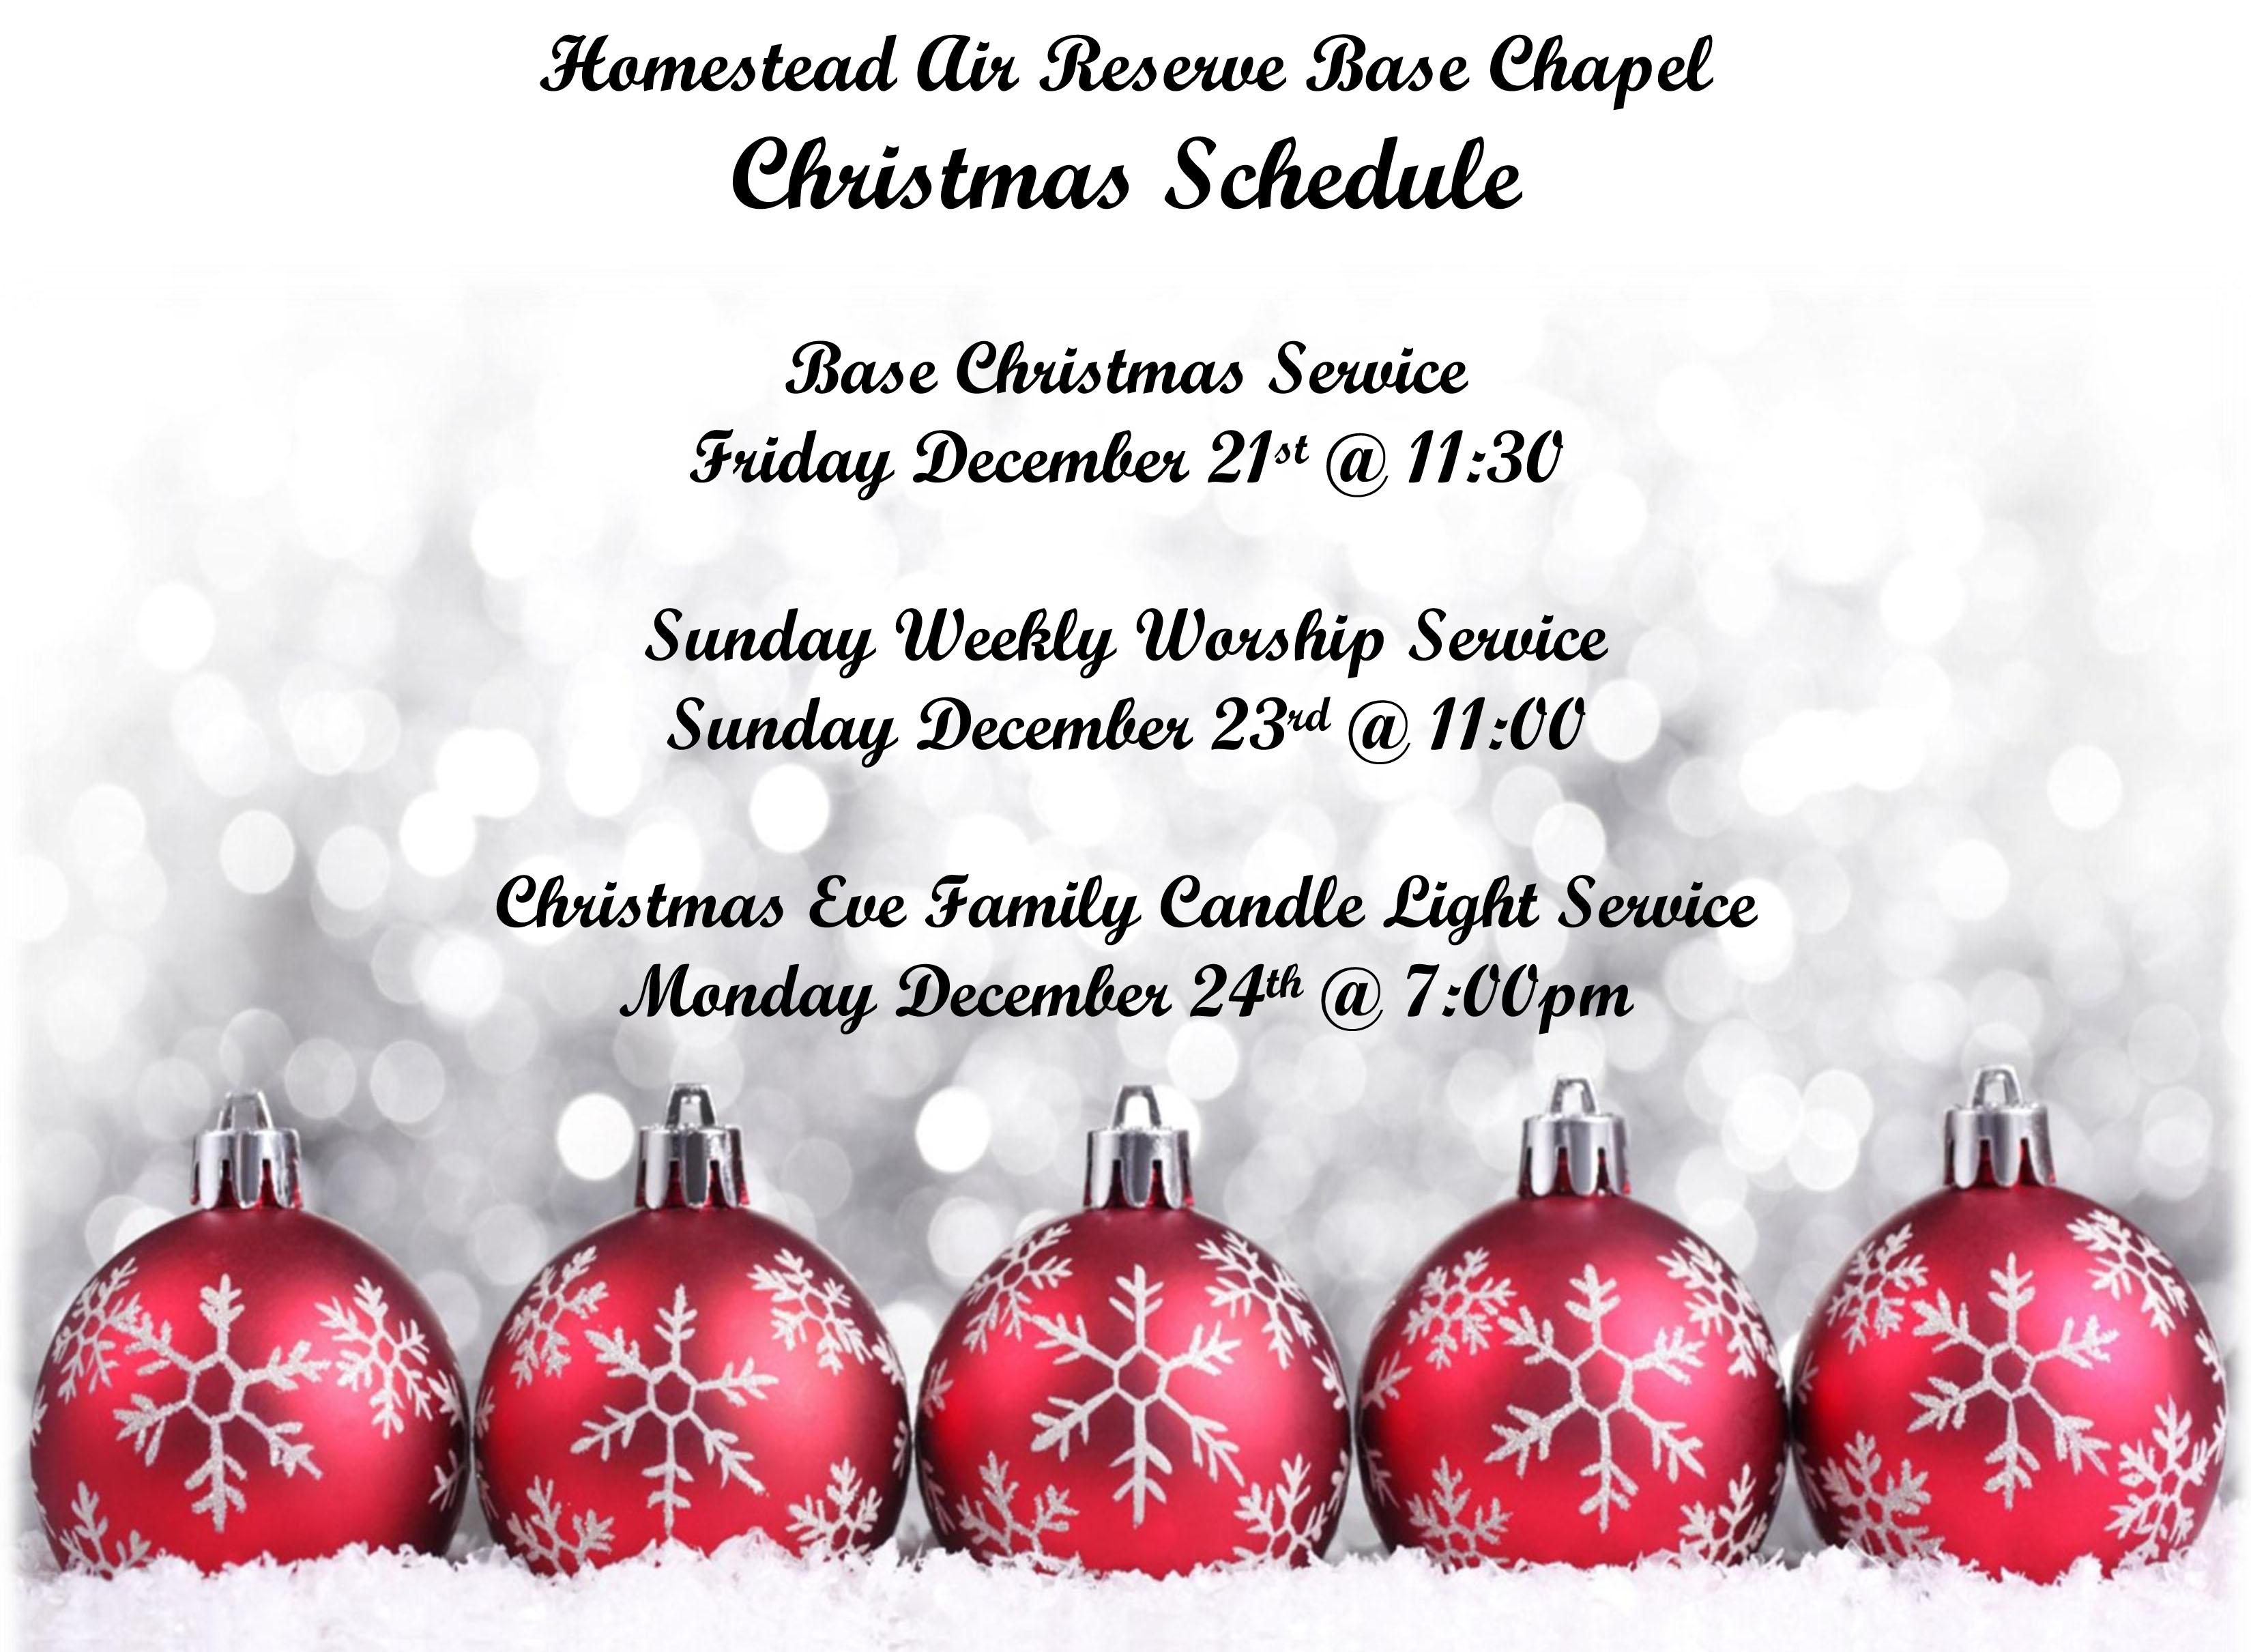 Base chapel Christmas schedule > Homestead Air Reserve Base ...